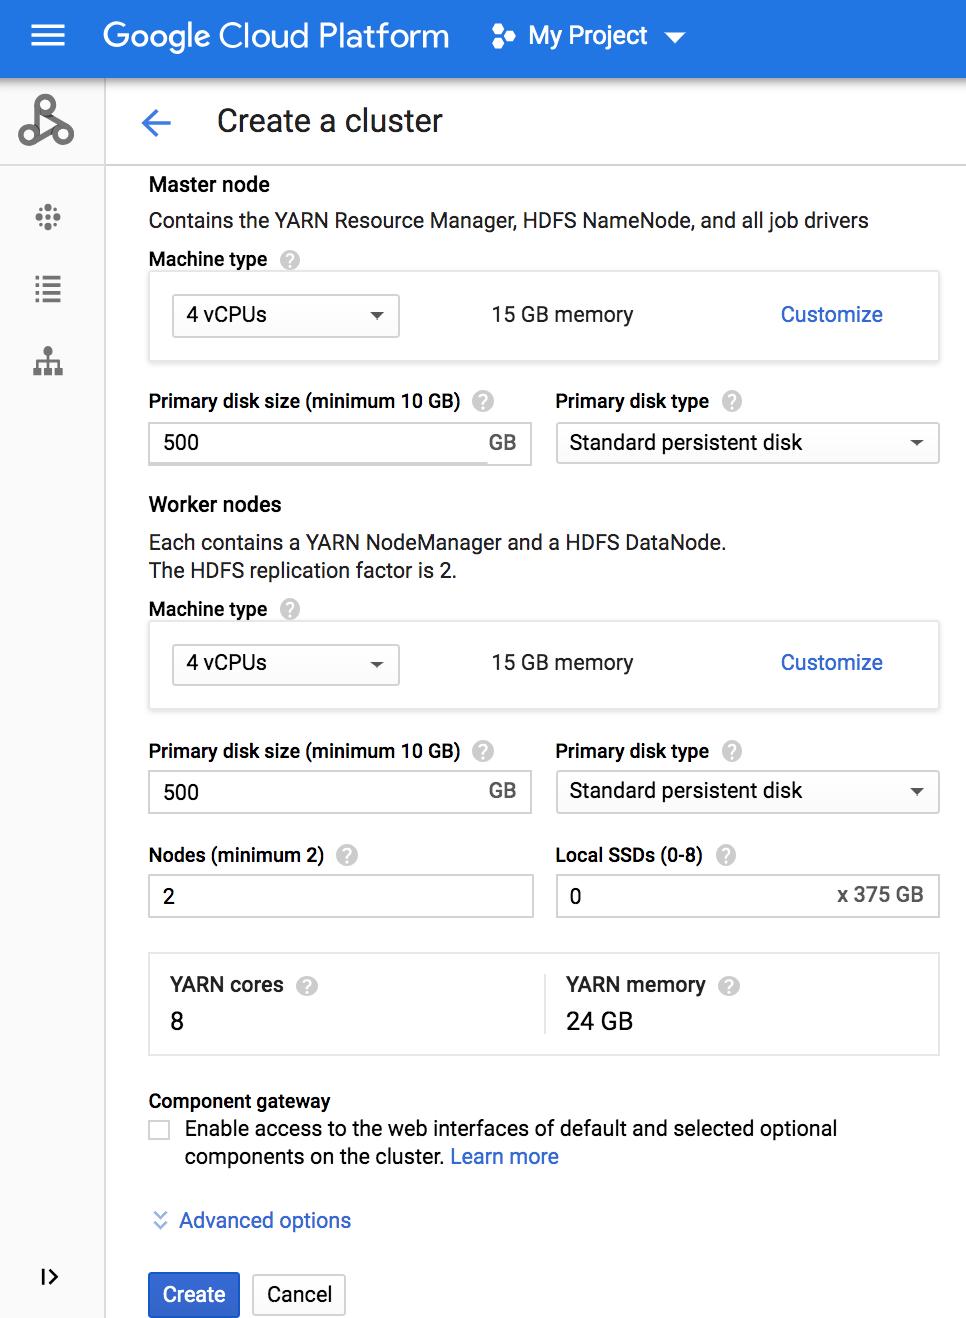 Install and run a Jupyter notebook on a Cloud Dataproc